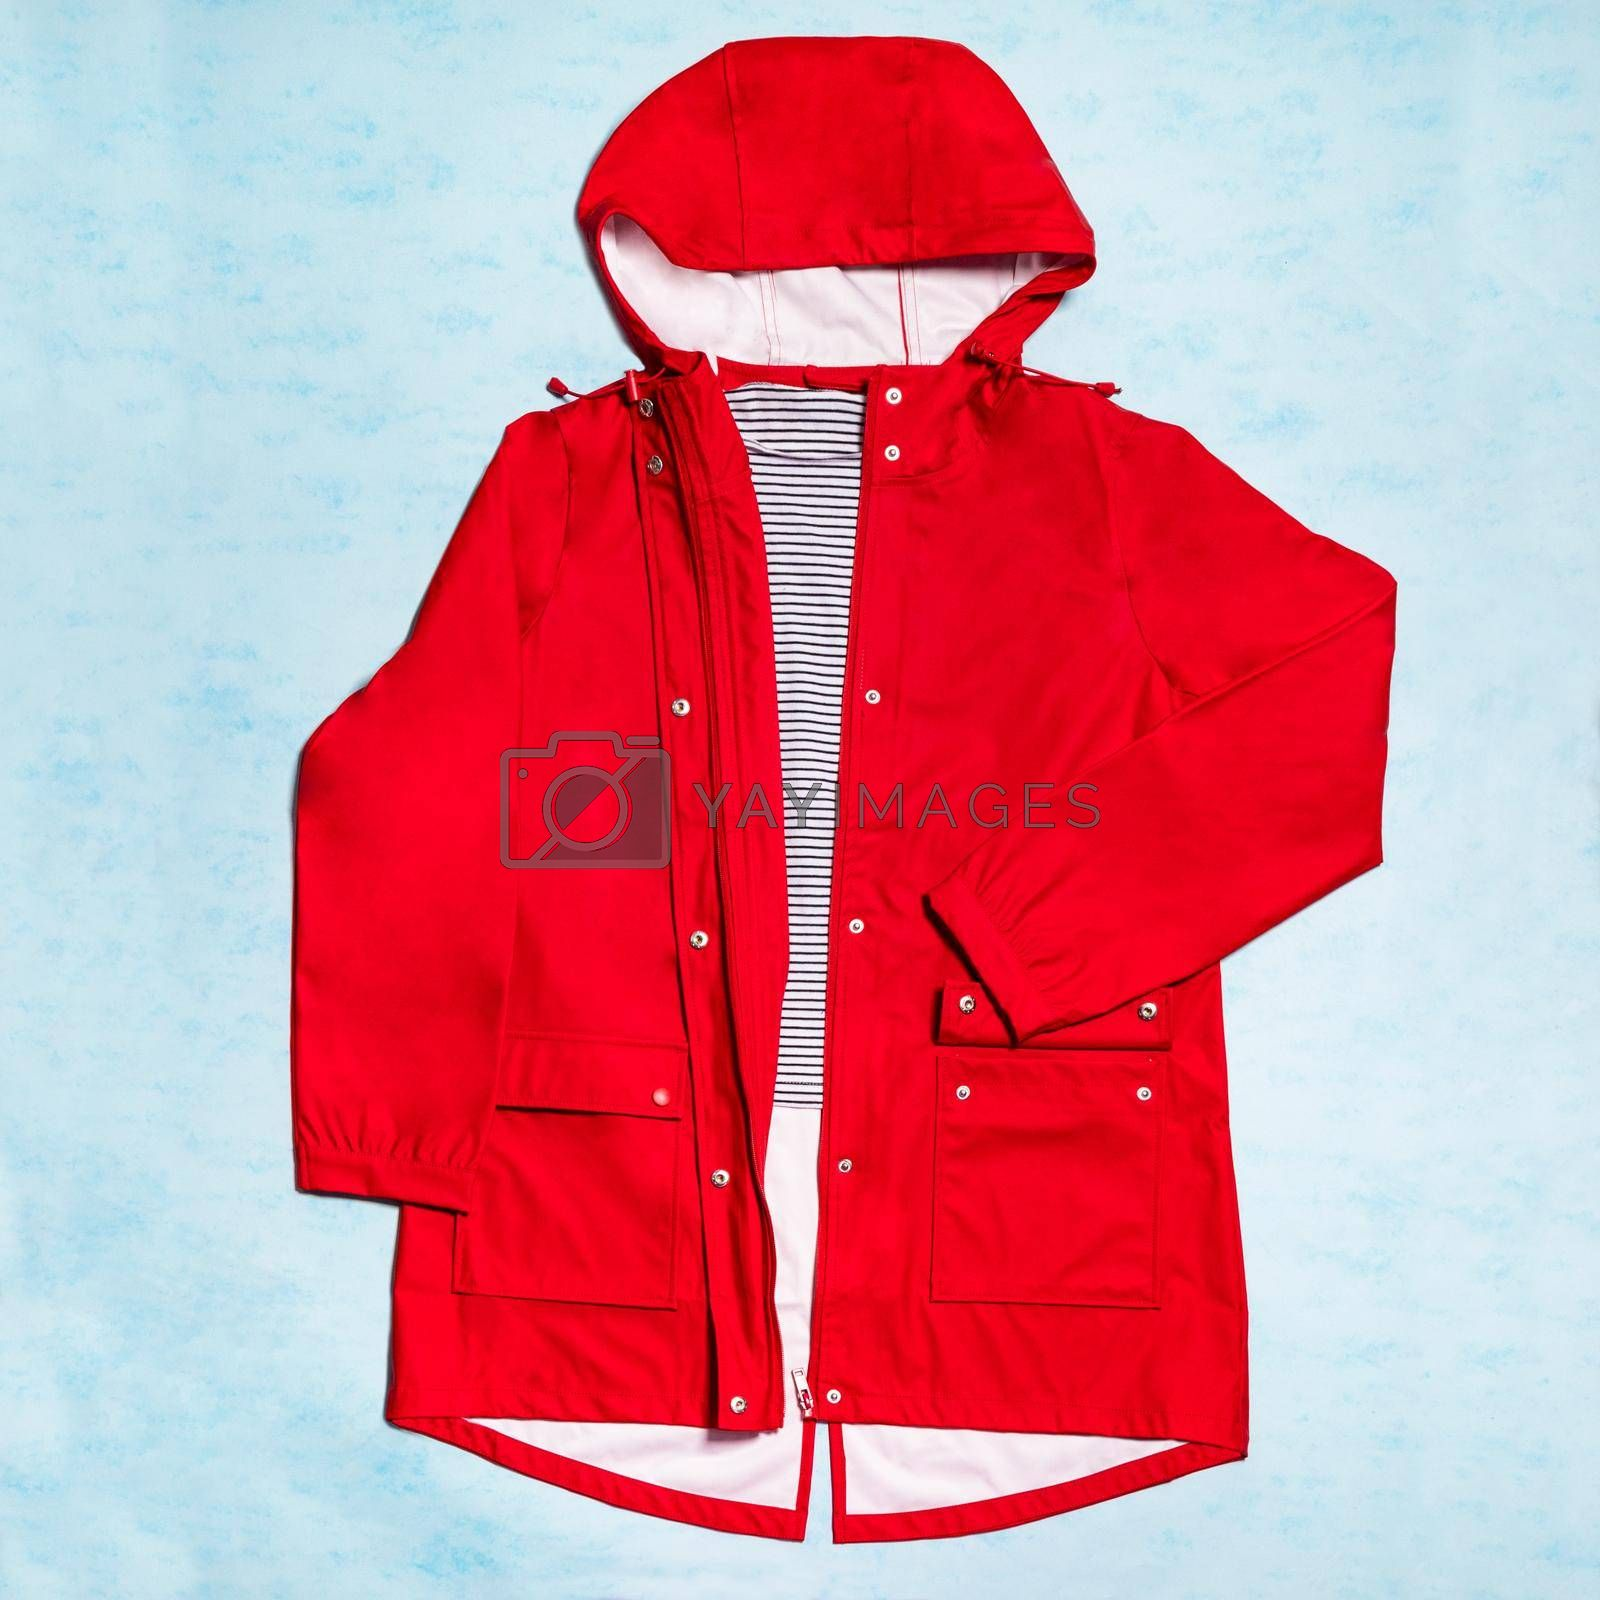 Red hood sweatshirt mock up isolated top view